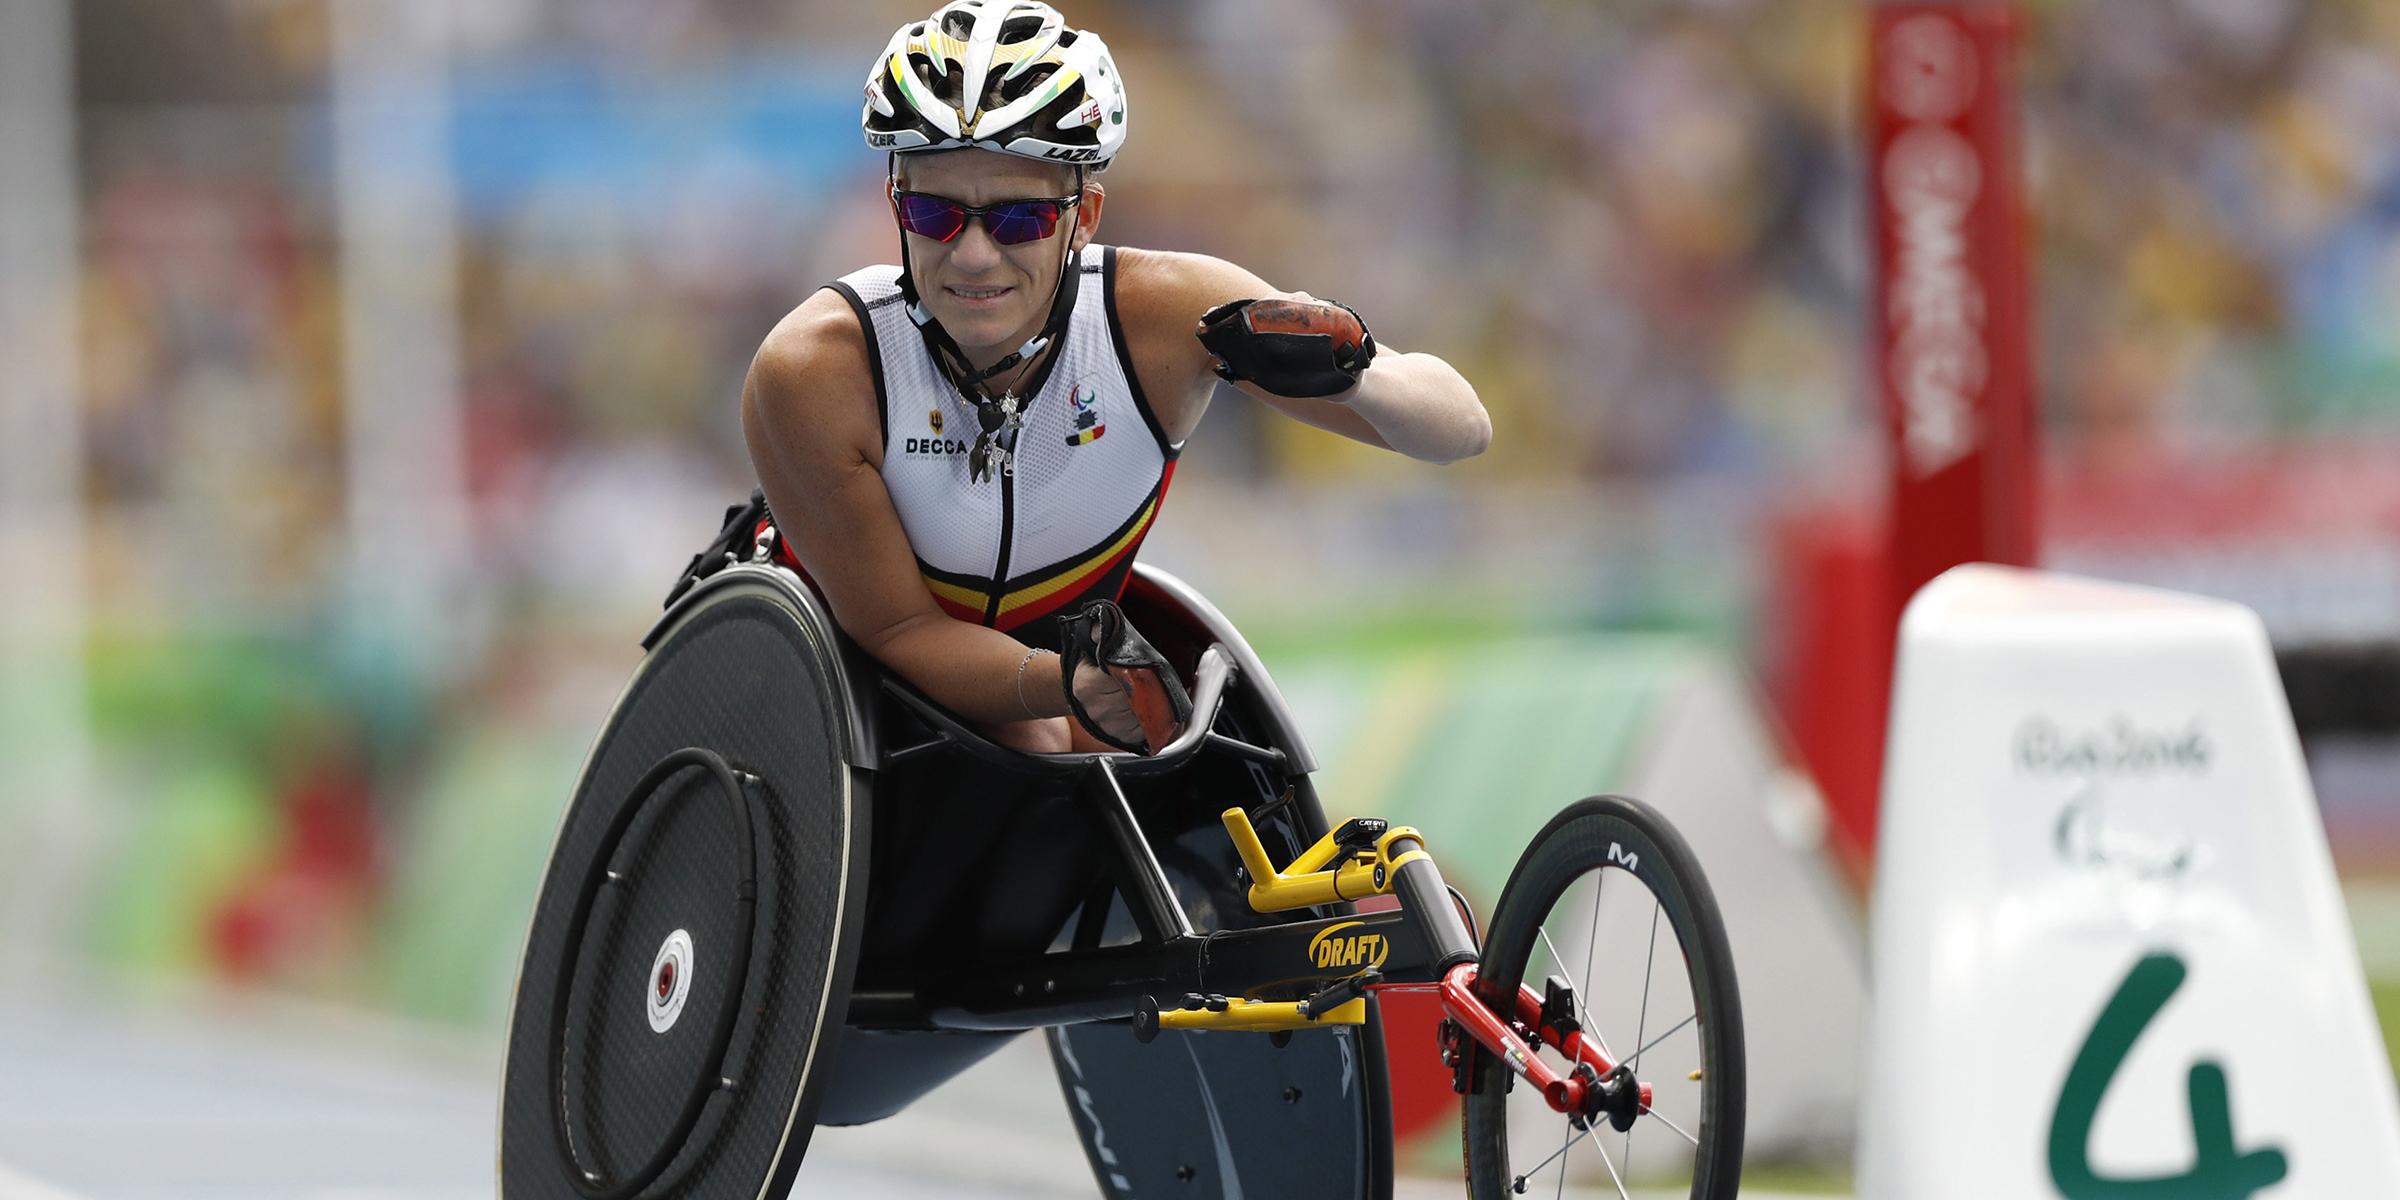 Paralympic champion Marieke Vervoort ends her life in Belgium